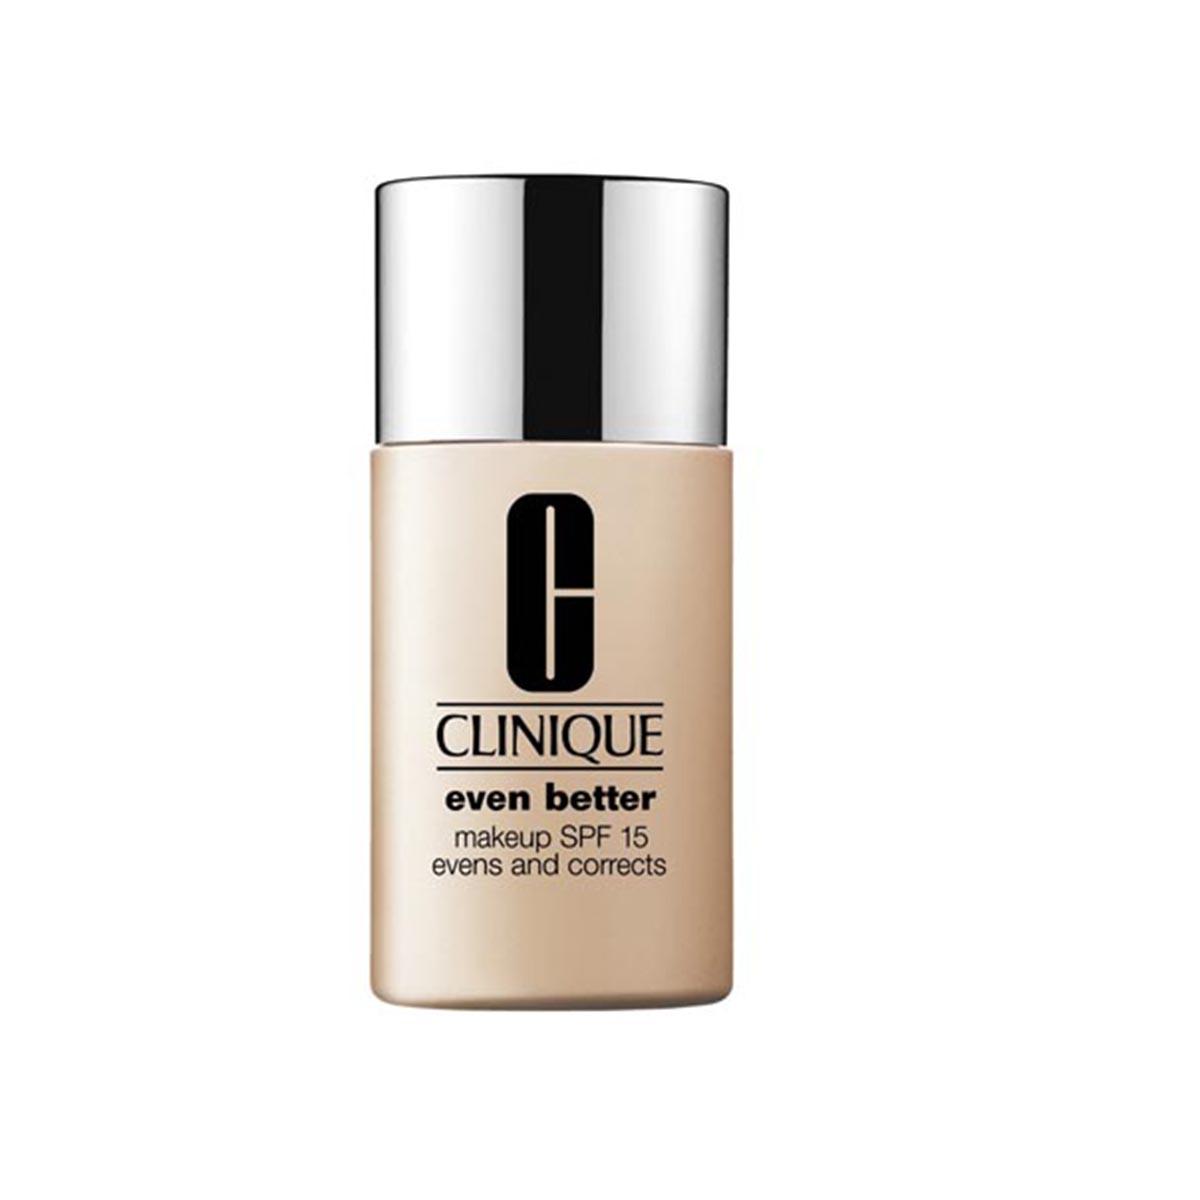 Clinique maquillaje even better cn52 neutral